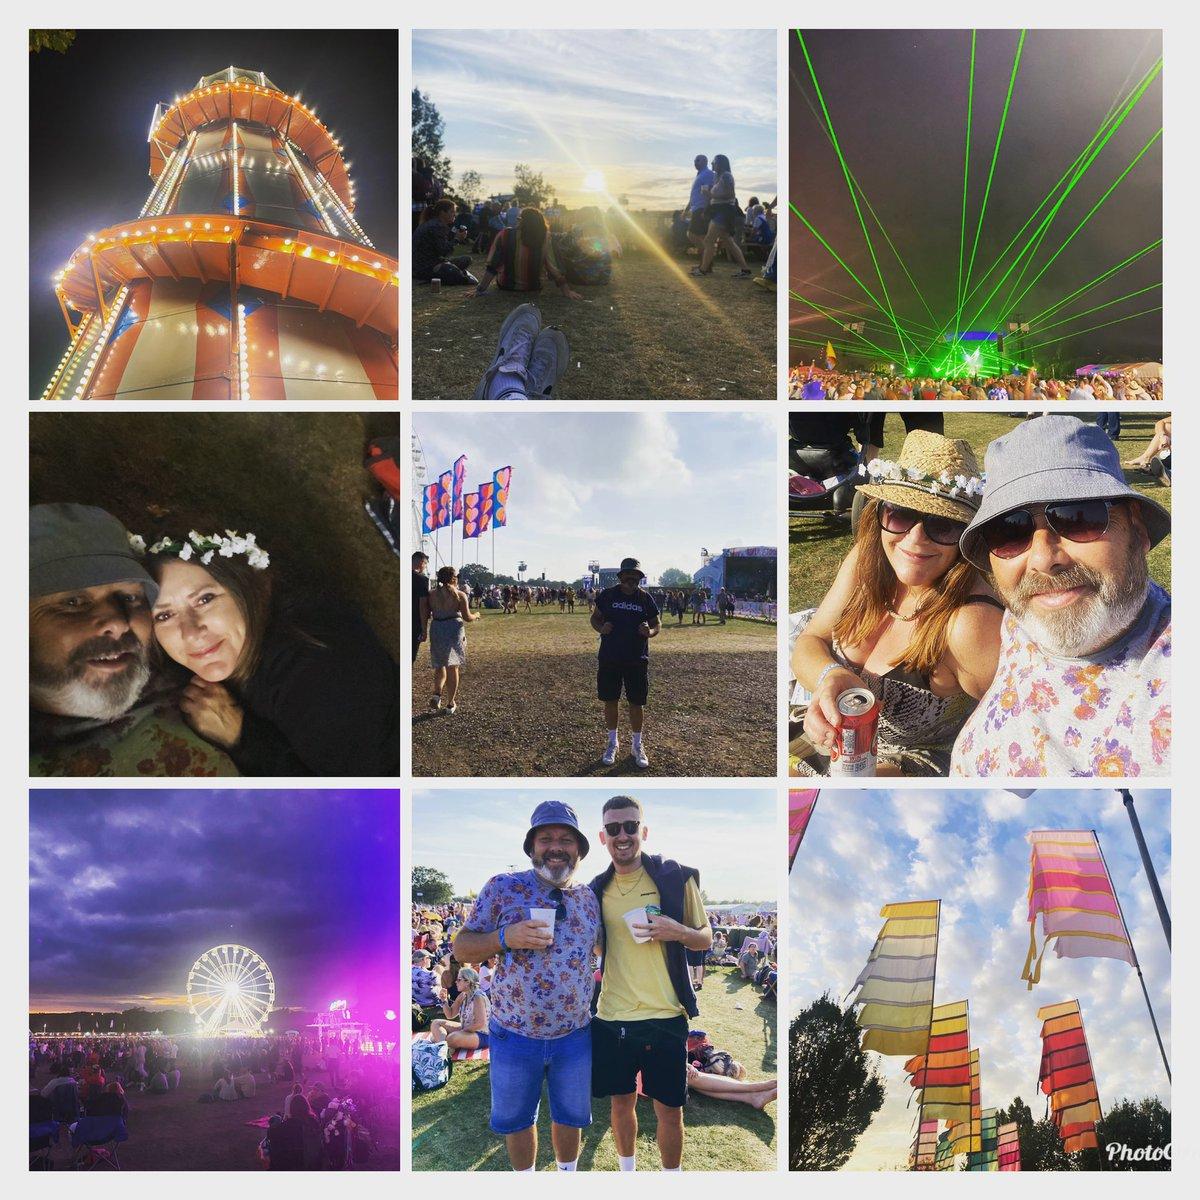 Cracking Festival Weekend😎 @IsleOfWightFest #cinchxIOW